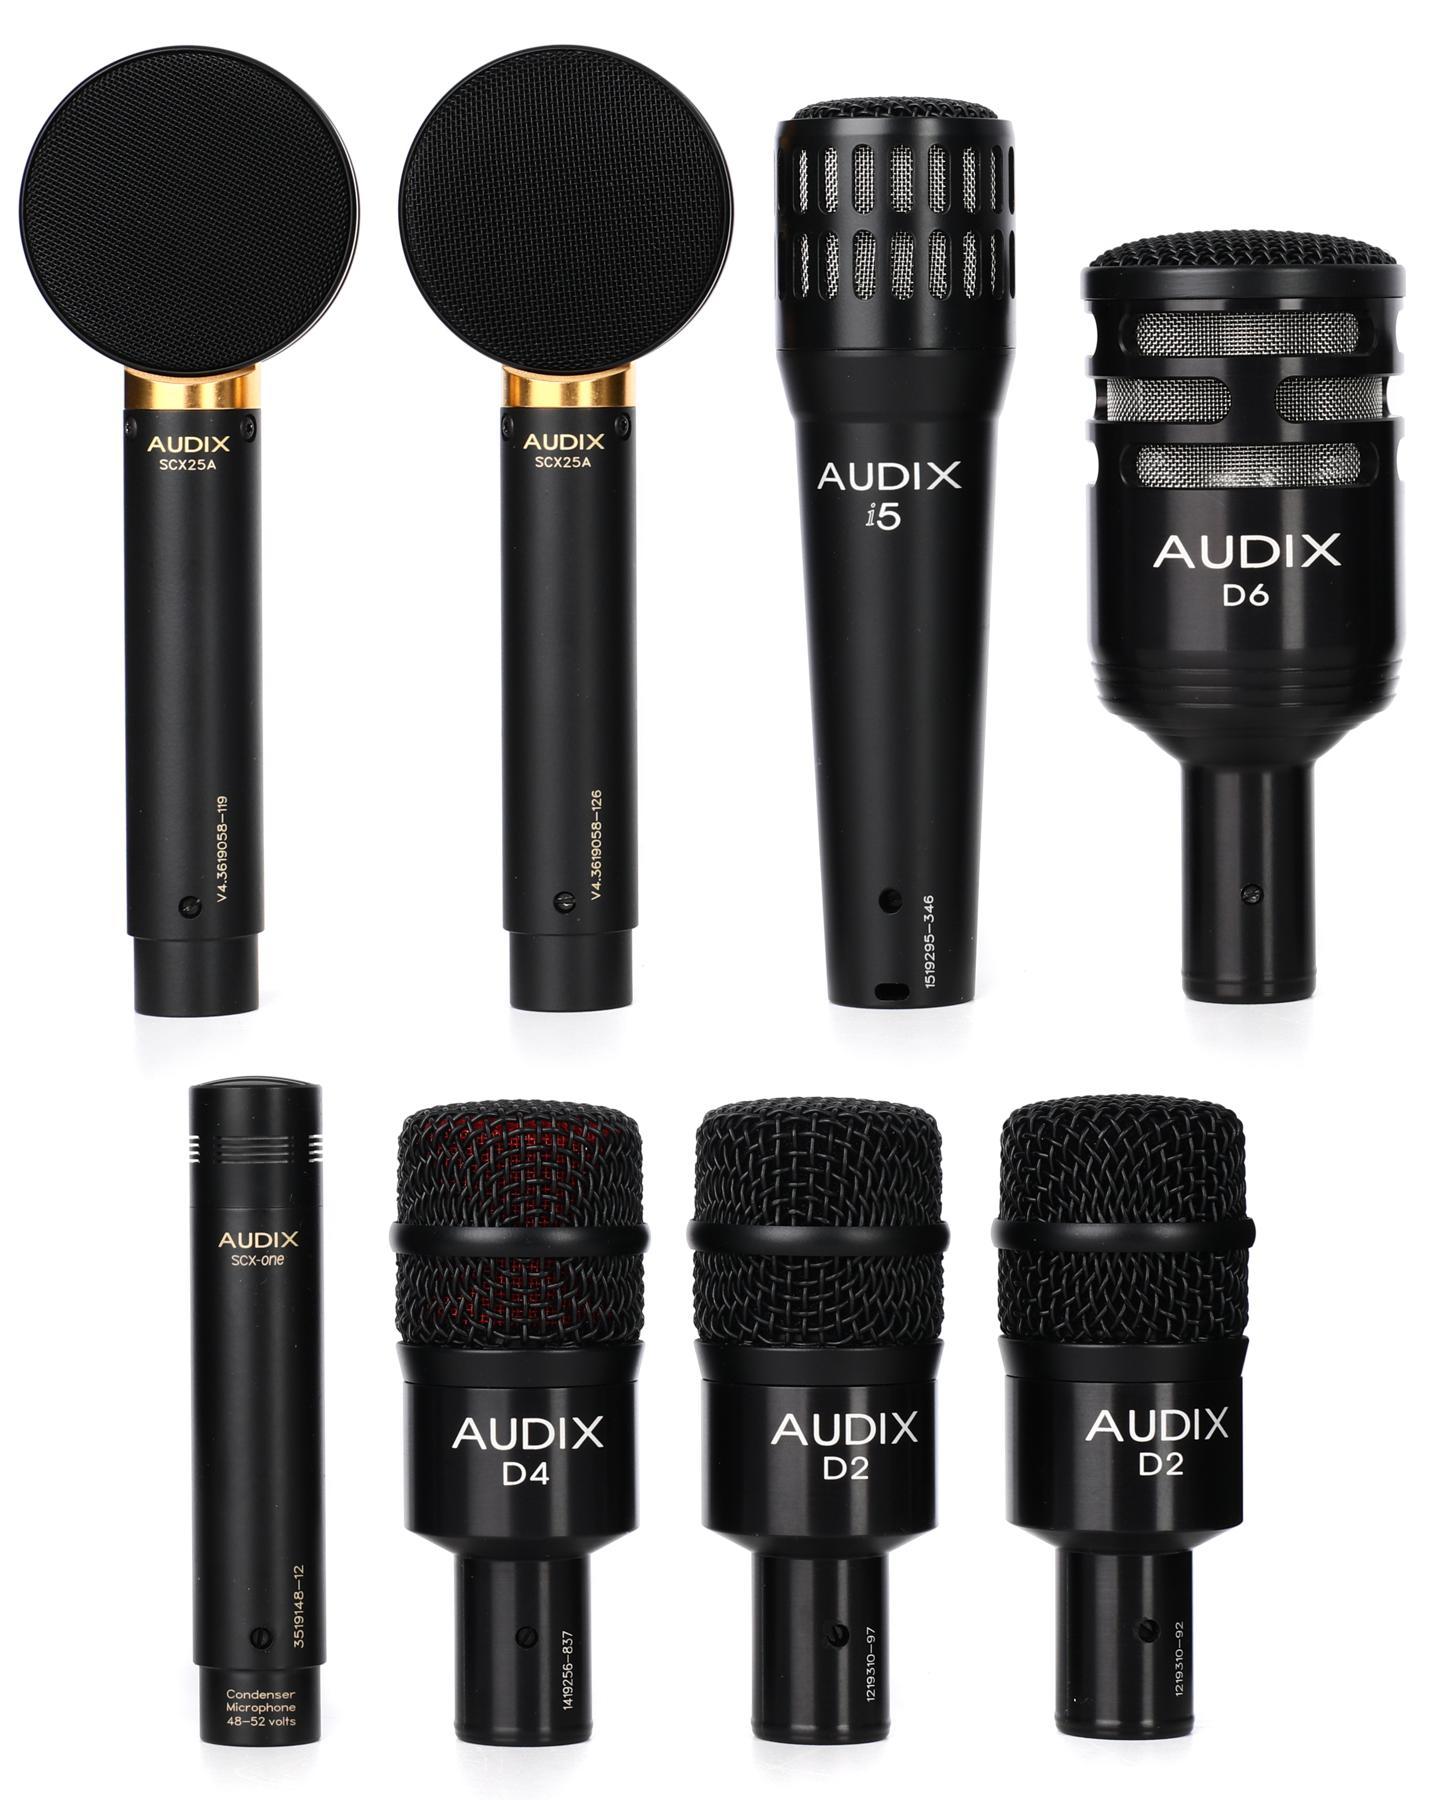 5. Audix Studio Elite 8 Kit